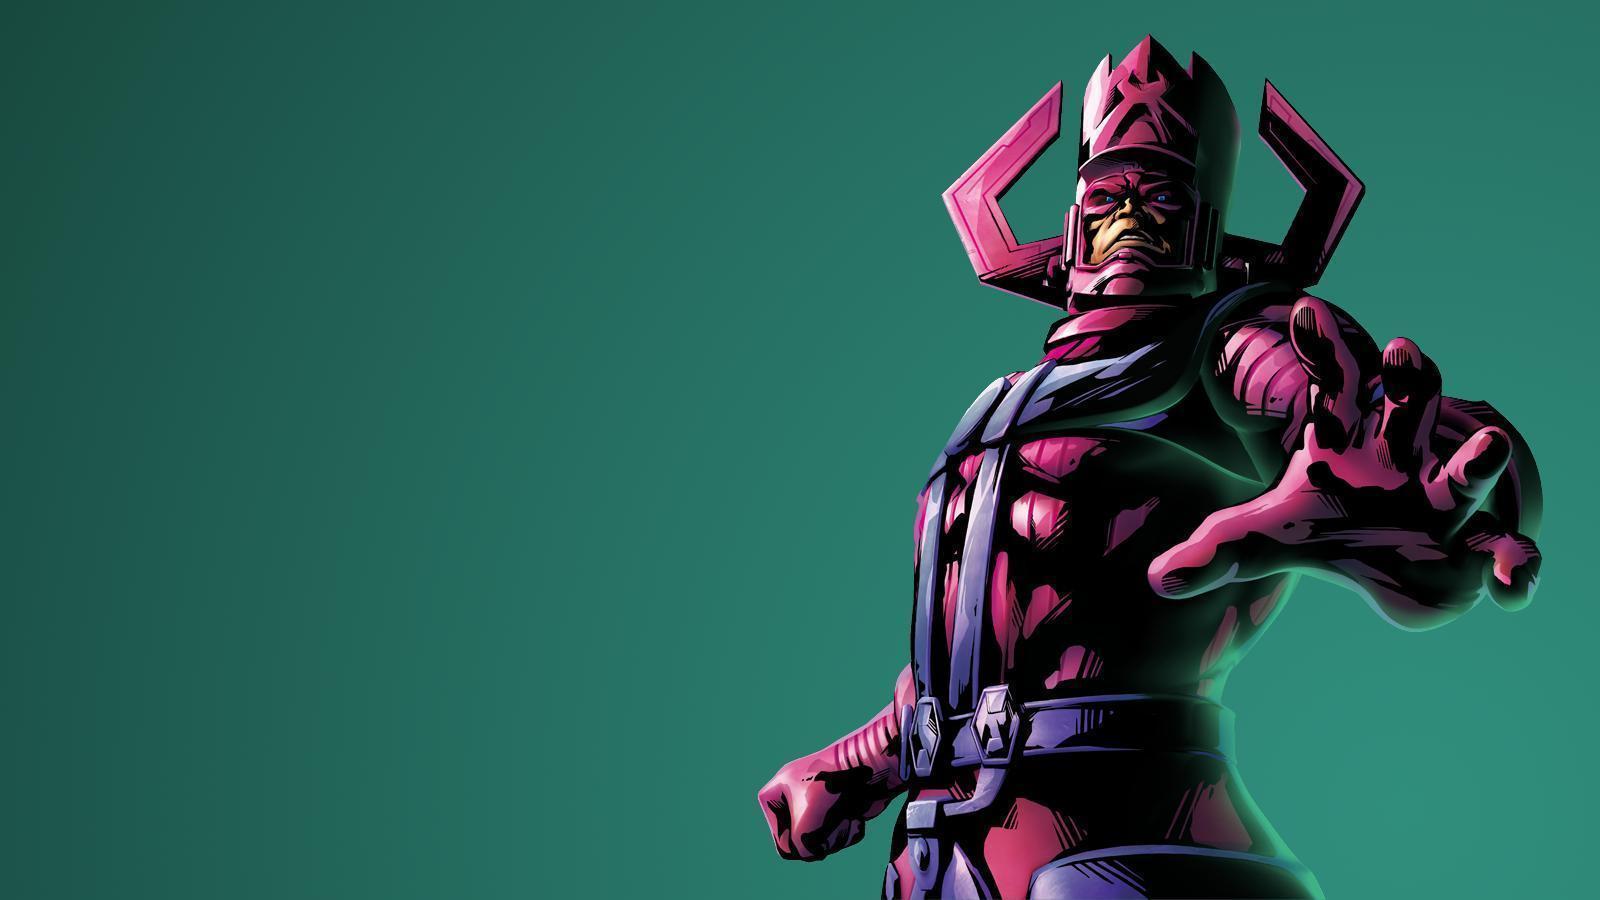 3d Superhero Wallpaper For Android Galactus Wallpapers Wallpaper Cave